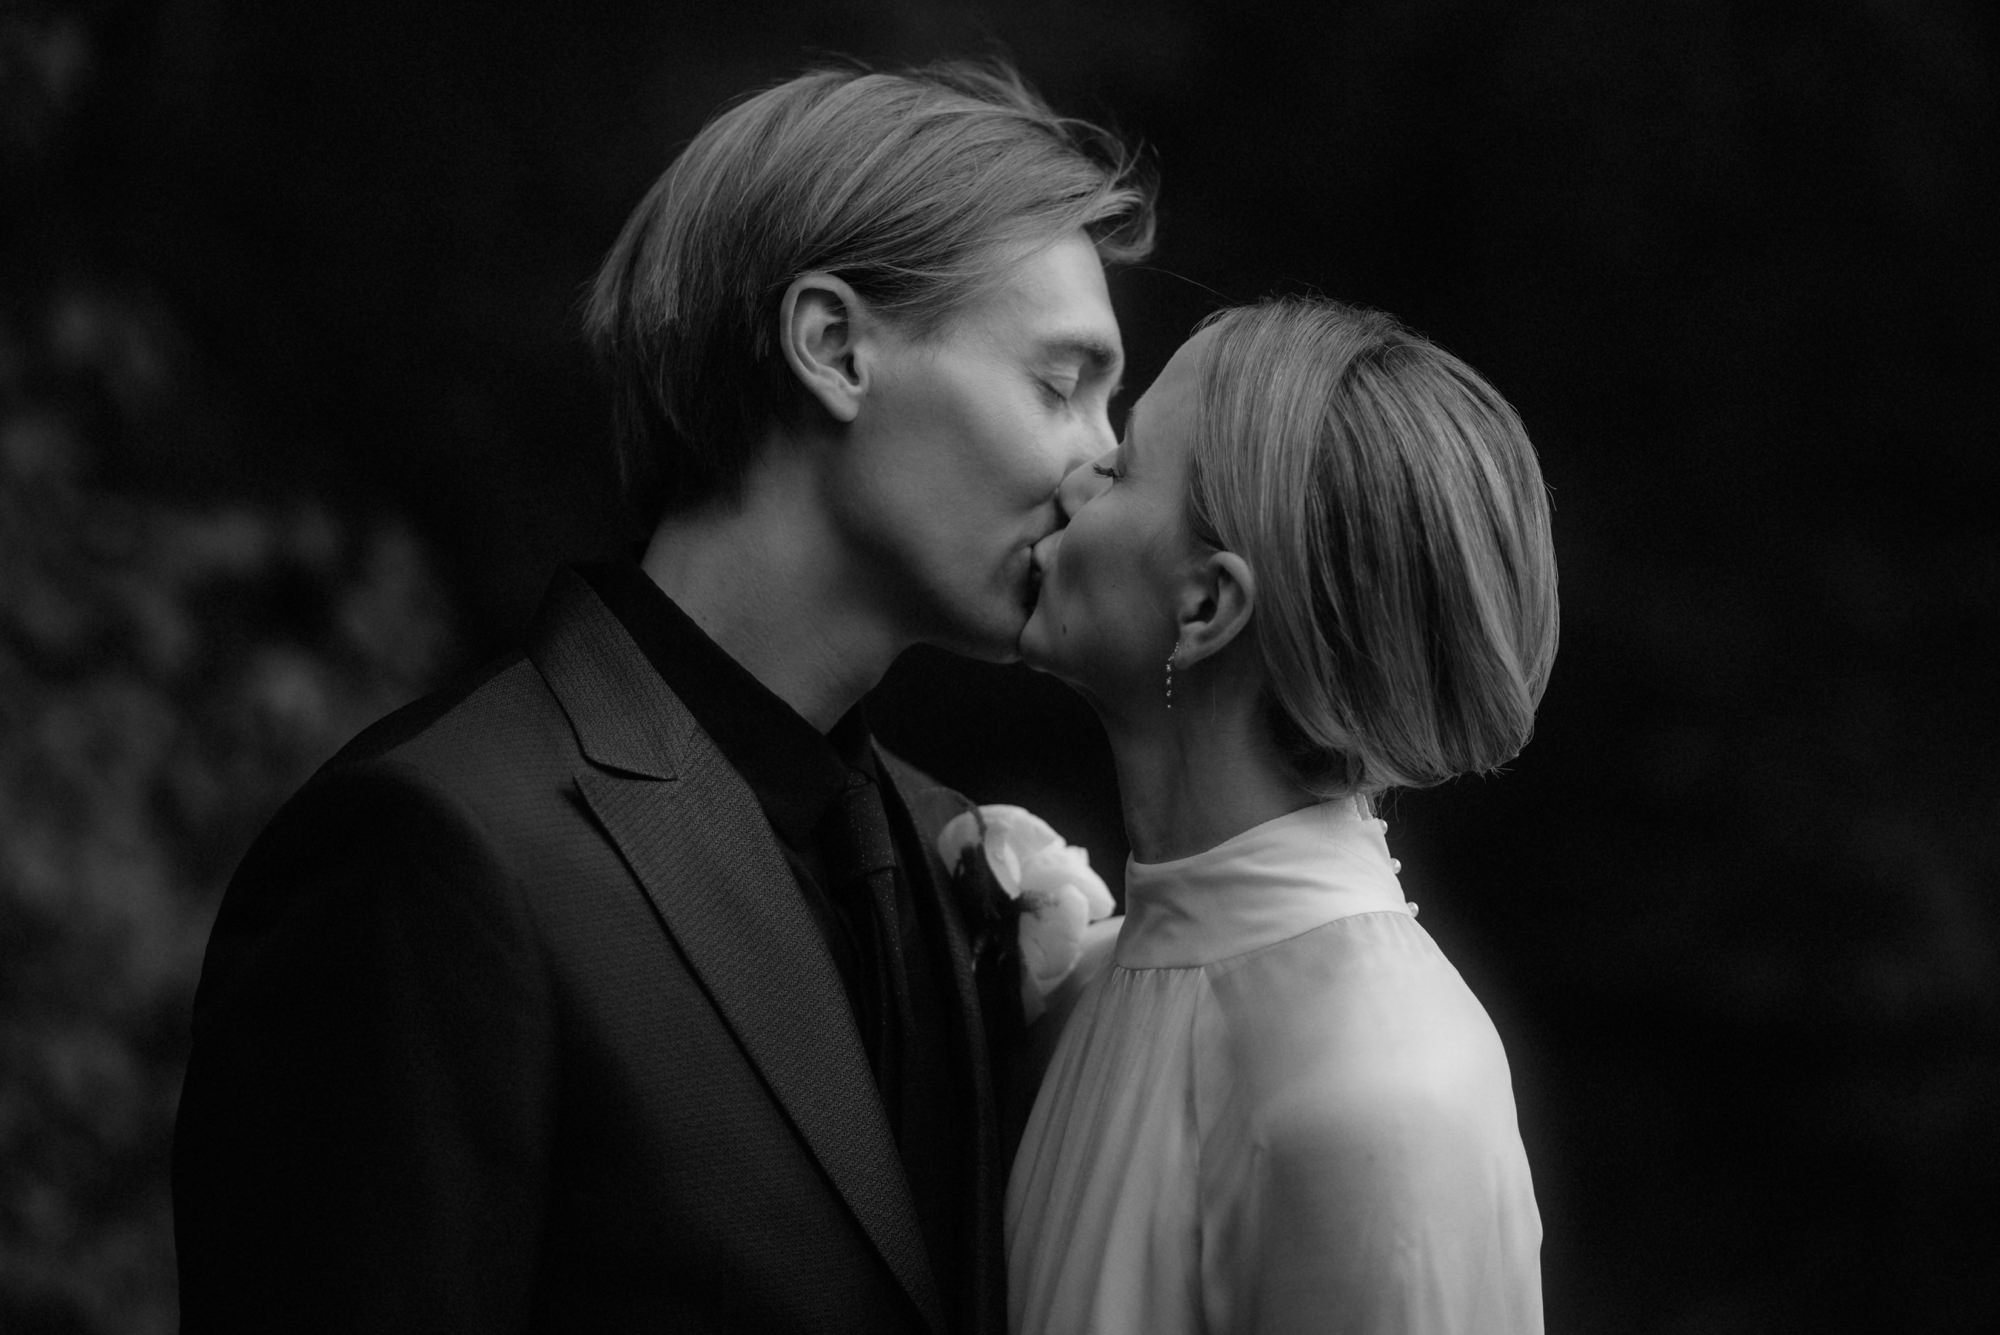 copenhagen wedding photography 0030 1